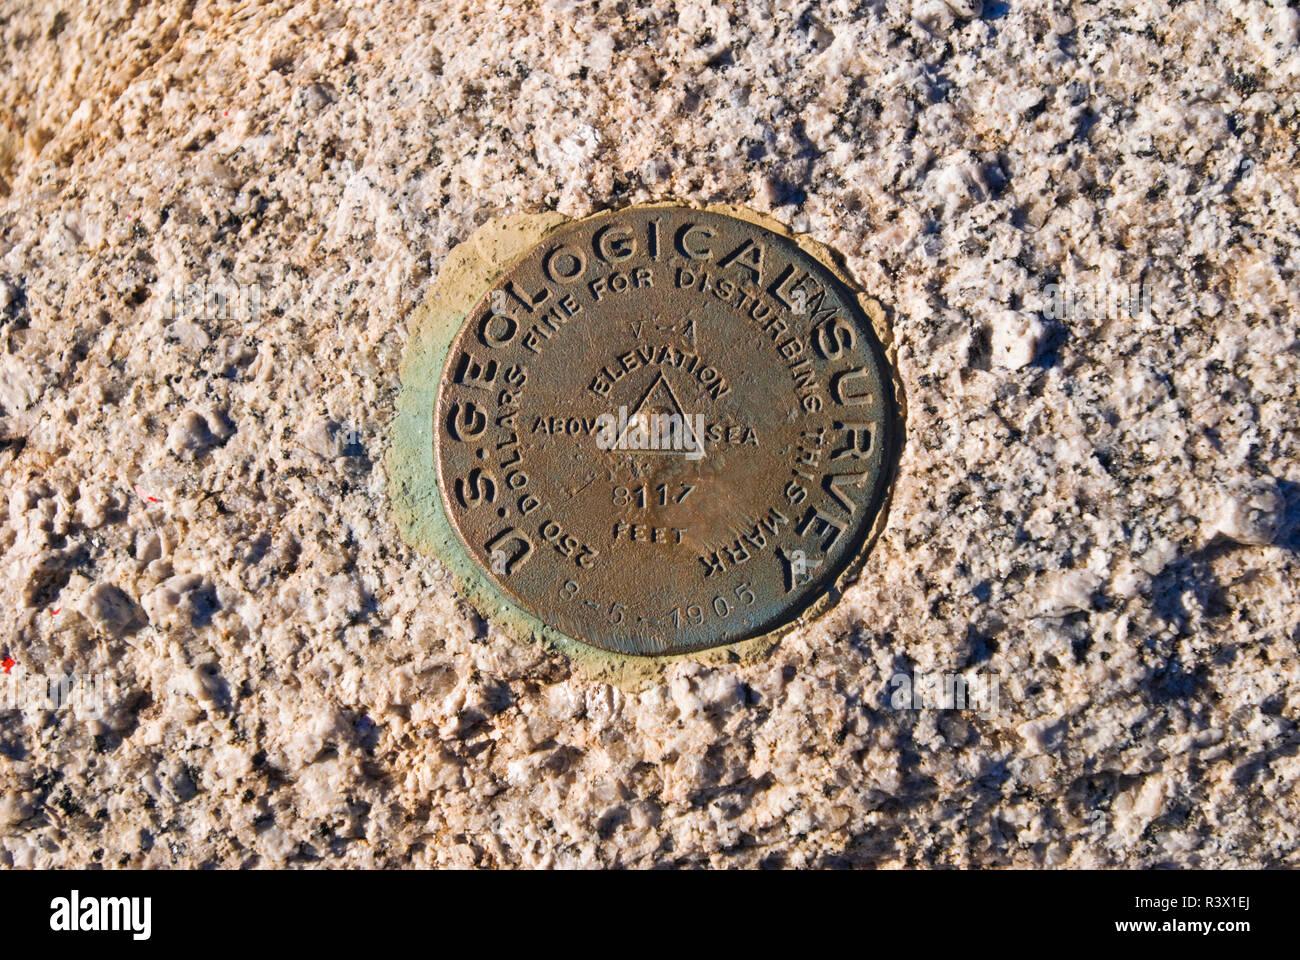 USGS survey marker on the summit of Sentinel Dome, Yosemite National Park, California, USA - Stock Image